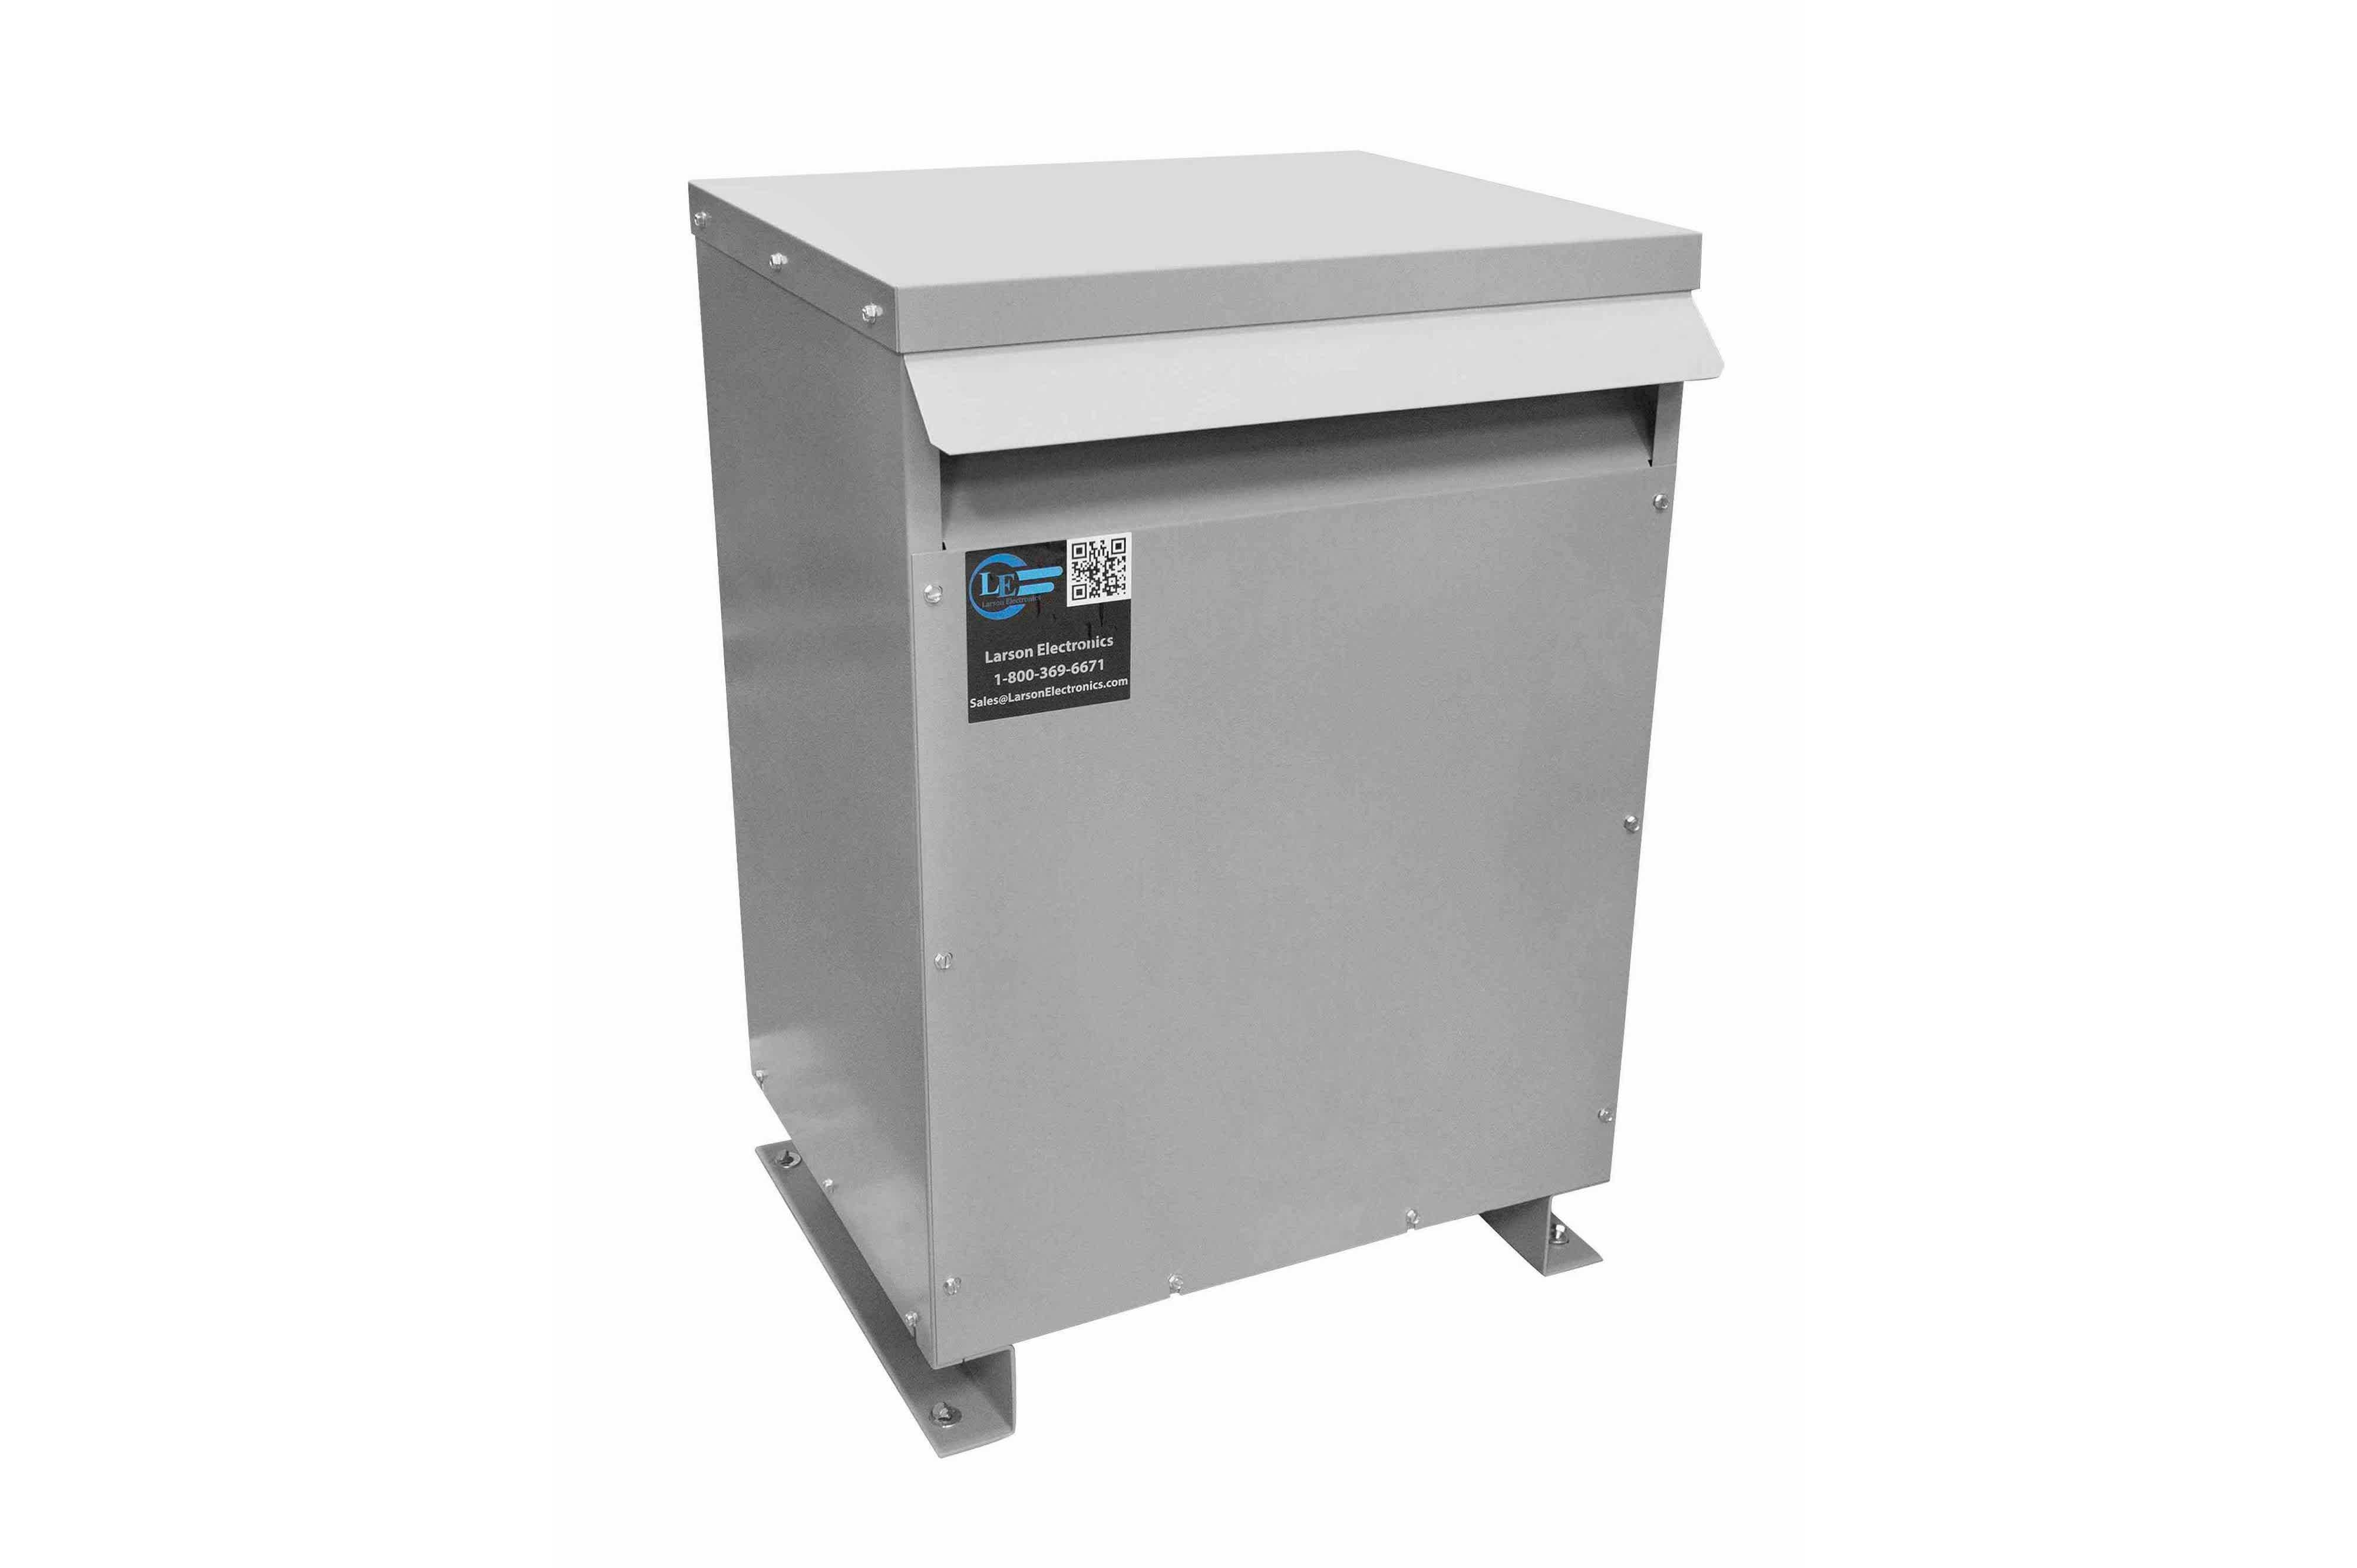 400 kVA 3PH Isolation Transformer, 460V Wye Primary, 575Y/332 Wye-N Secondary, N3R, Ventilated, 60 Hz